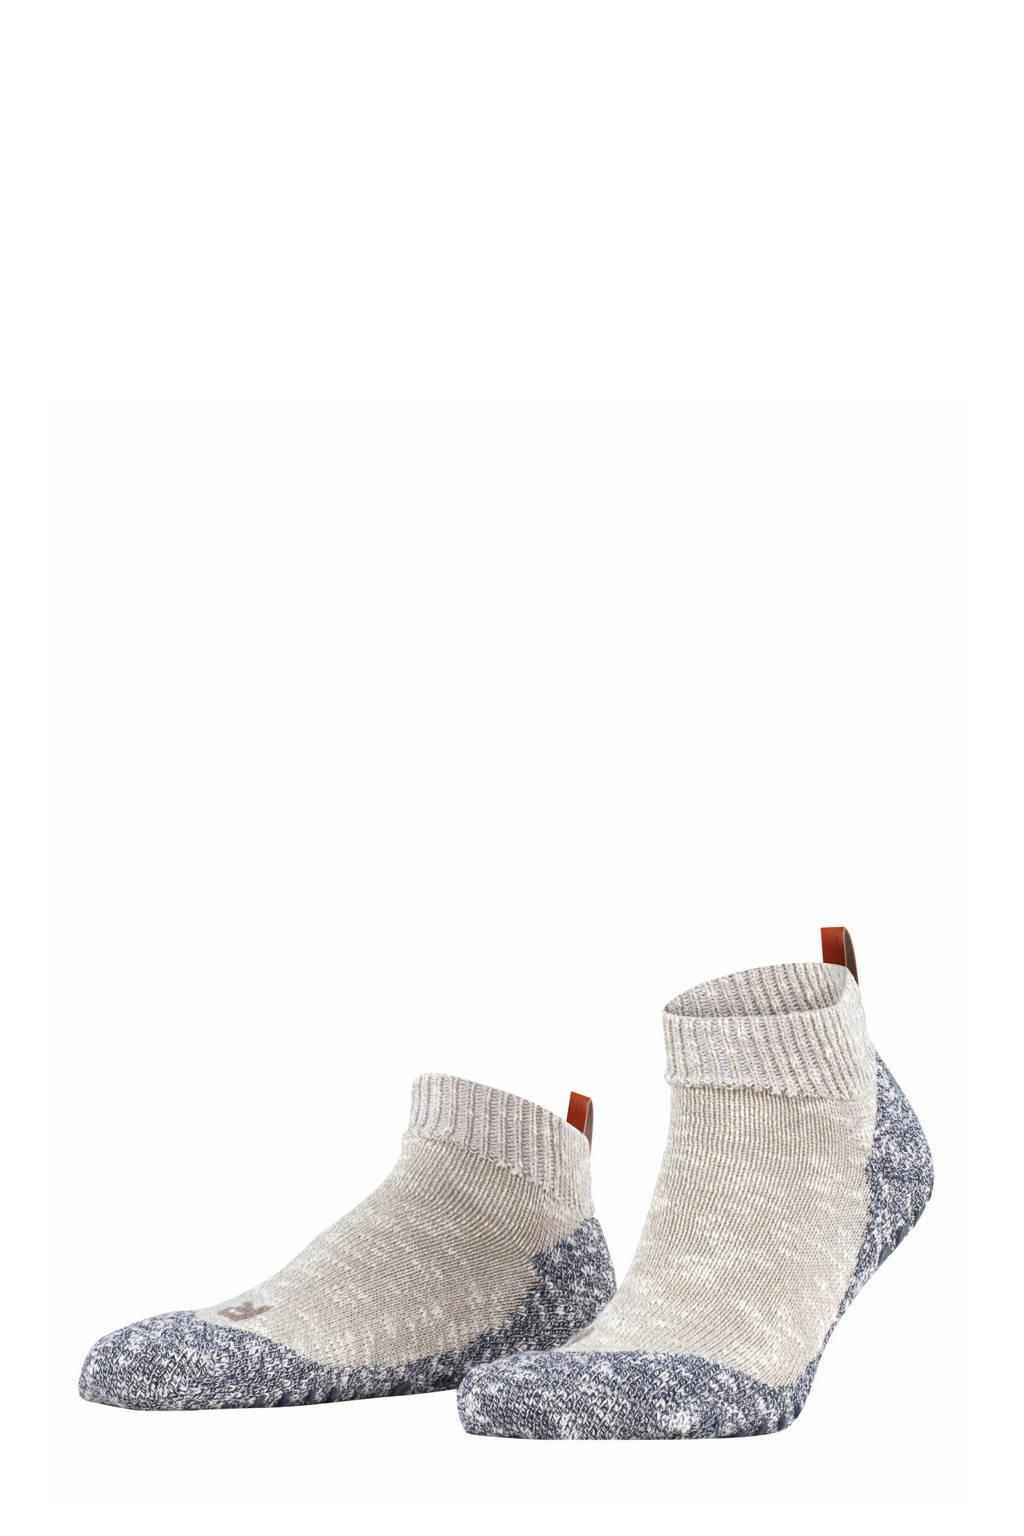 FALKE Lodge Homepad pantoffels beige/grijs, Beige/grijs